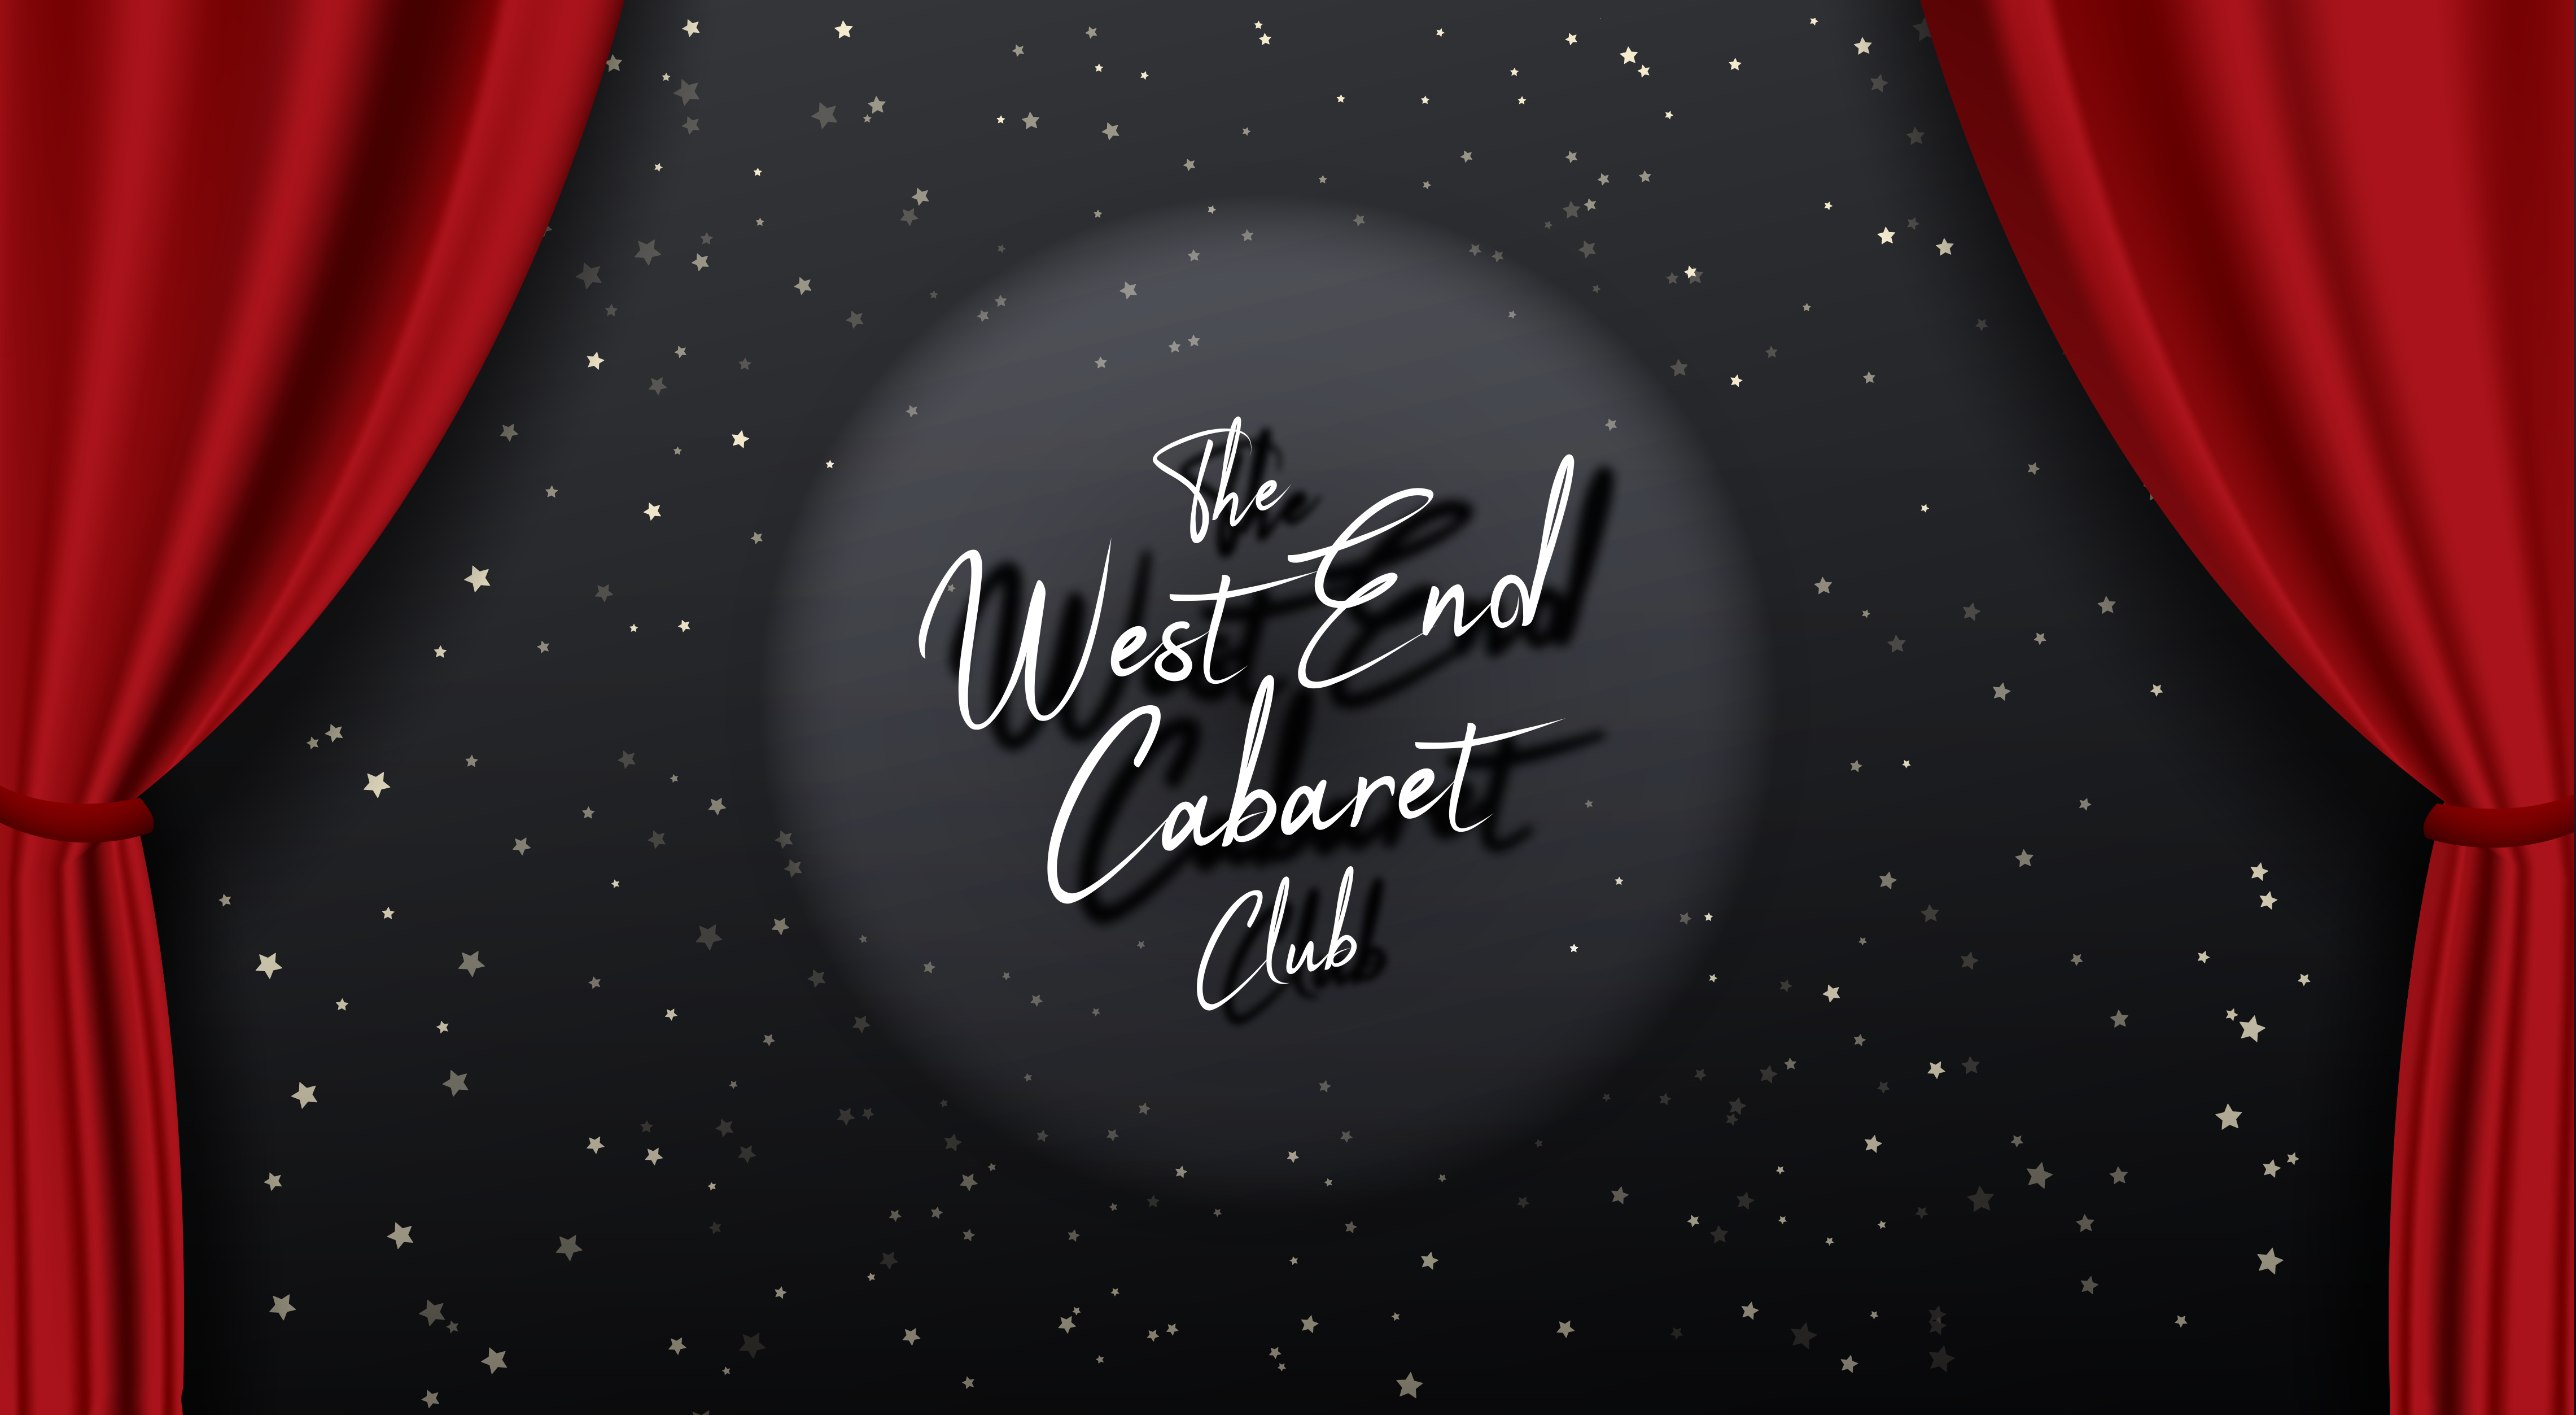 The West End Cabaret Club